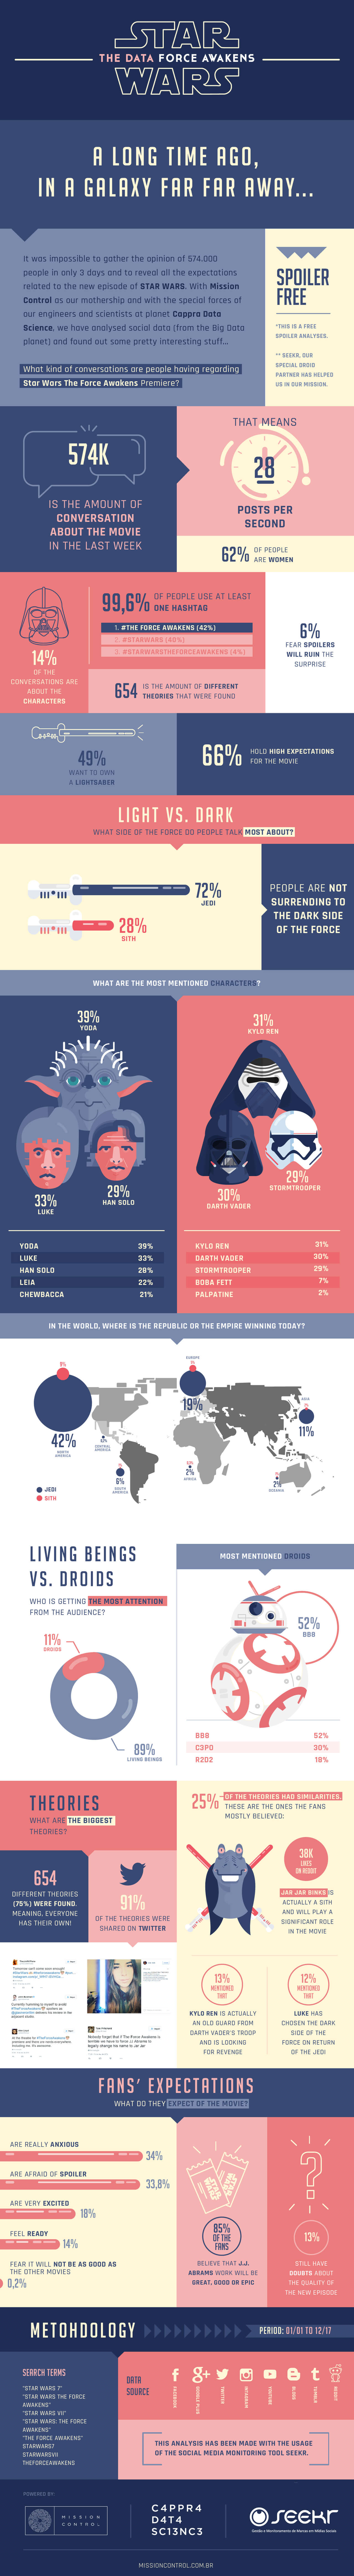 Best Infographics: Star Wars: The Data Force Awakens